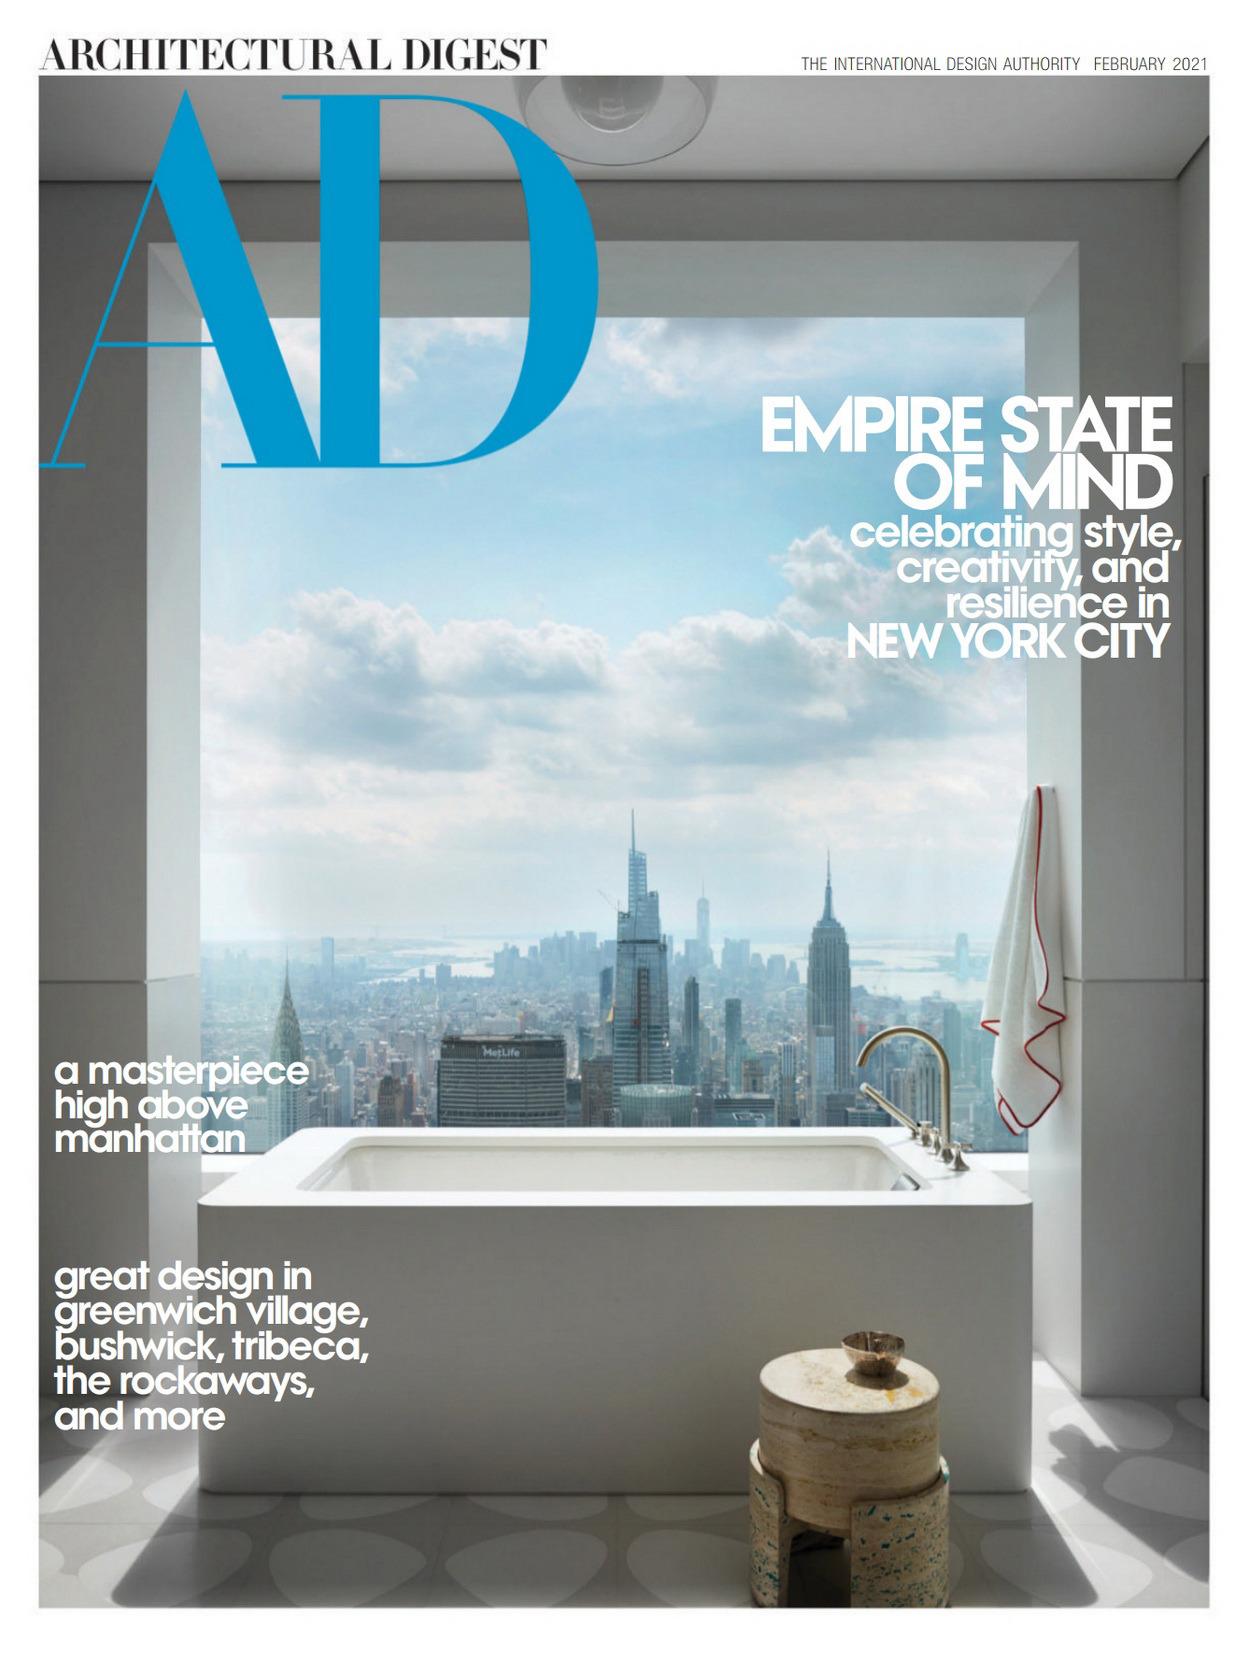 《AD》美国版室内室外设计杂志2021年02月号